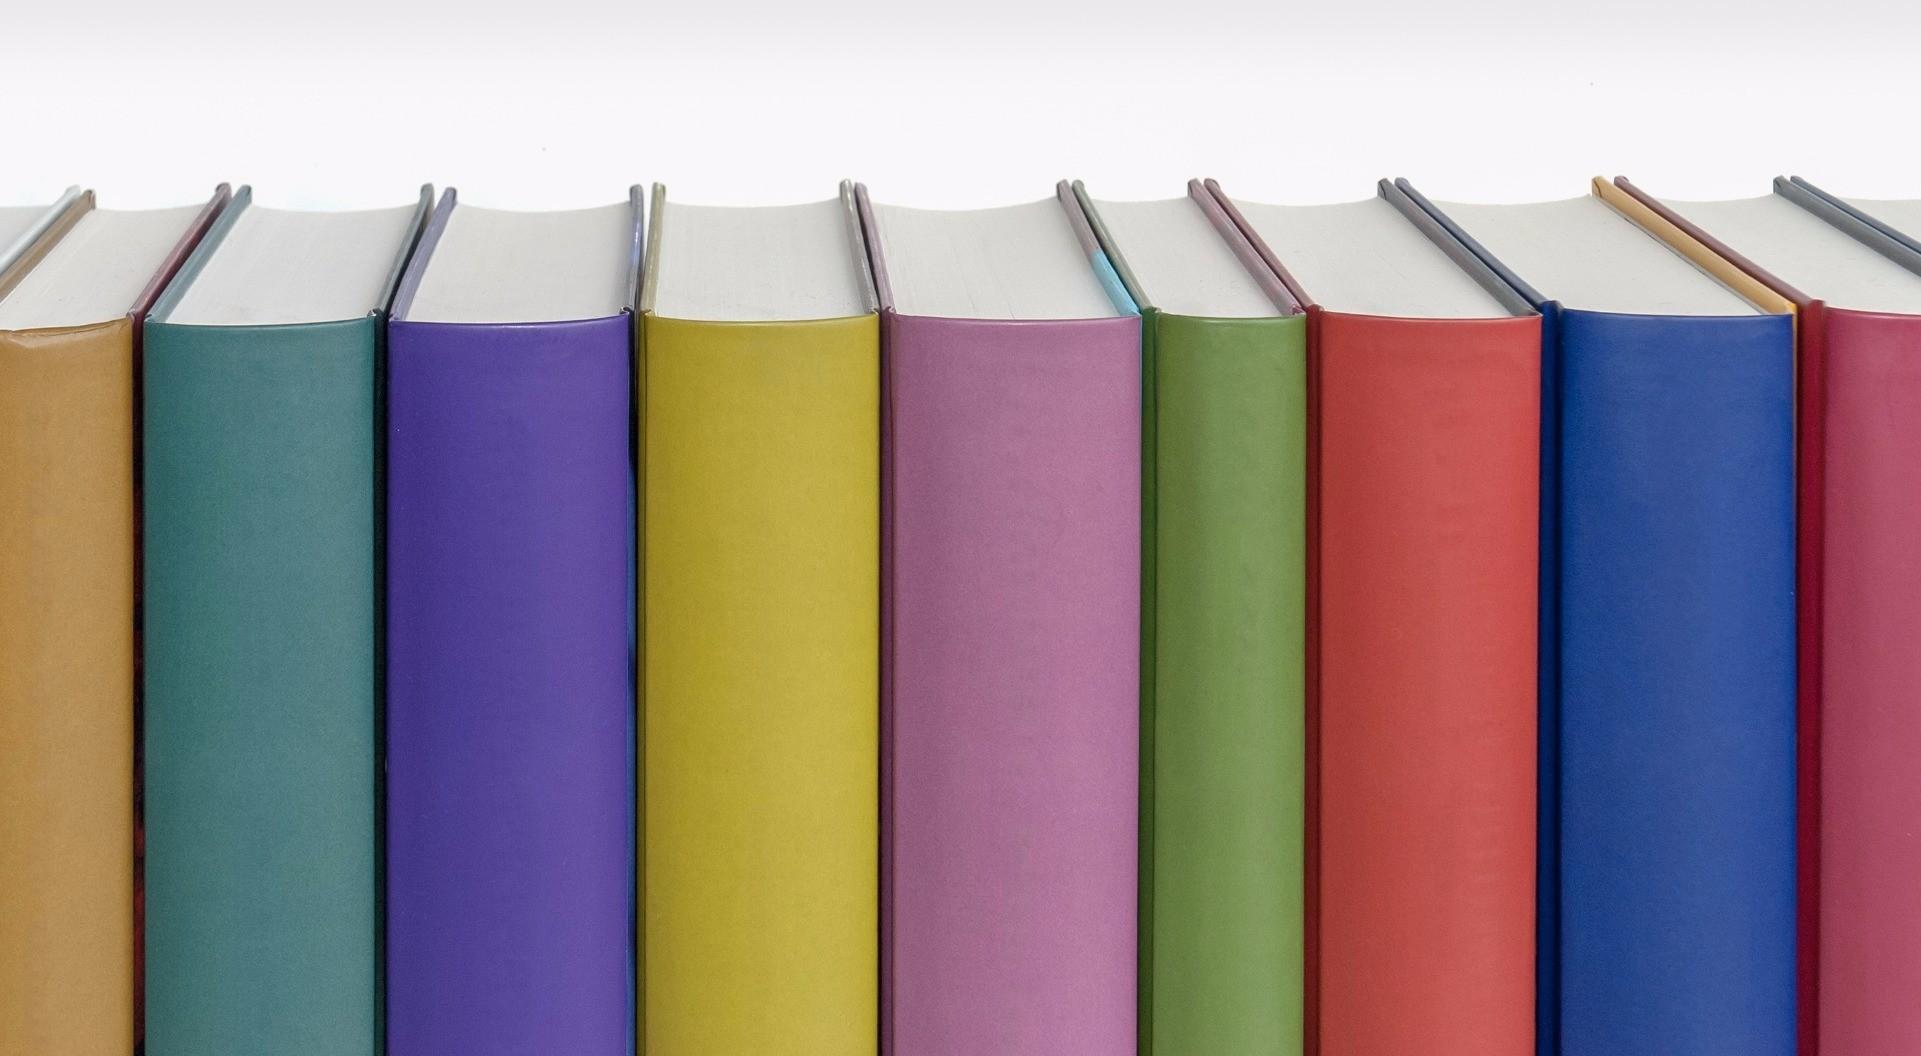 Bücherei.jpg